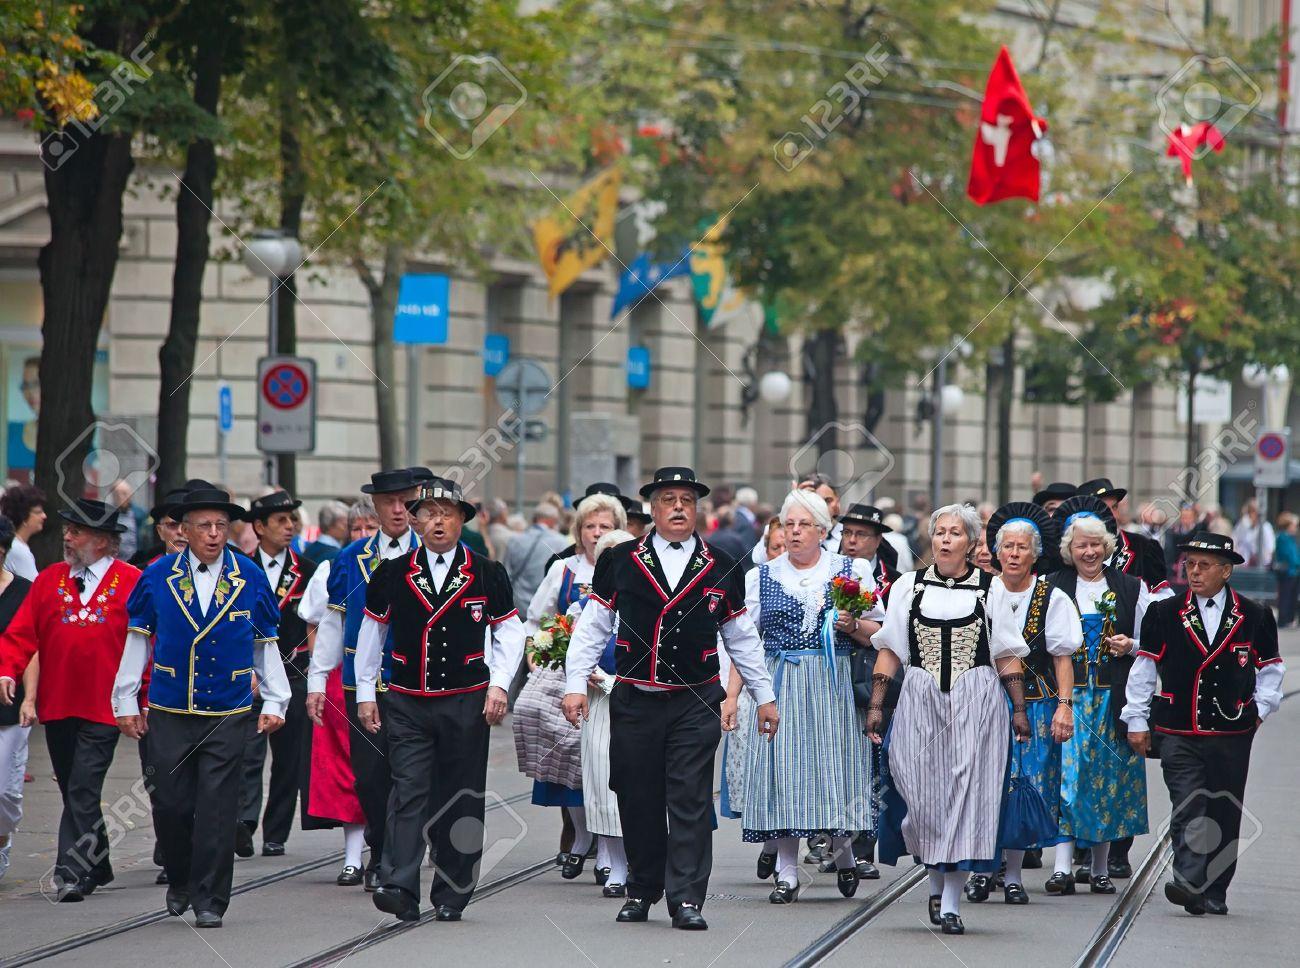 ZURICH - AUGUST 1: Swiss National Day parade on August 1, 2009 in Zurich, Switzerland. Representatives of canton St. Gallen in a historical costume. Stock Photo - 13580940